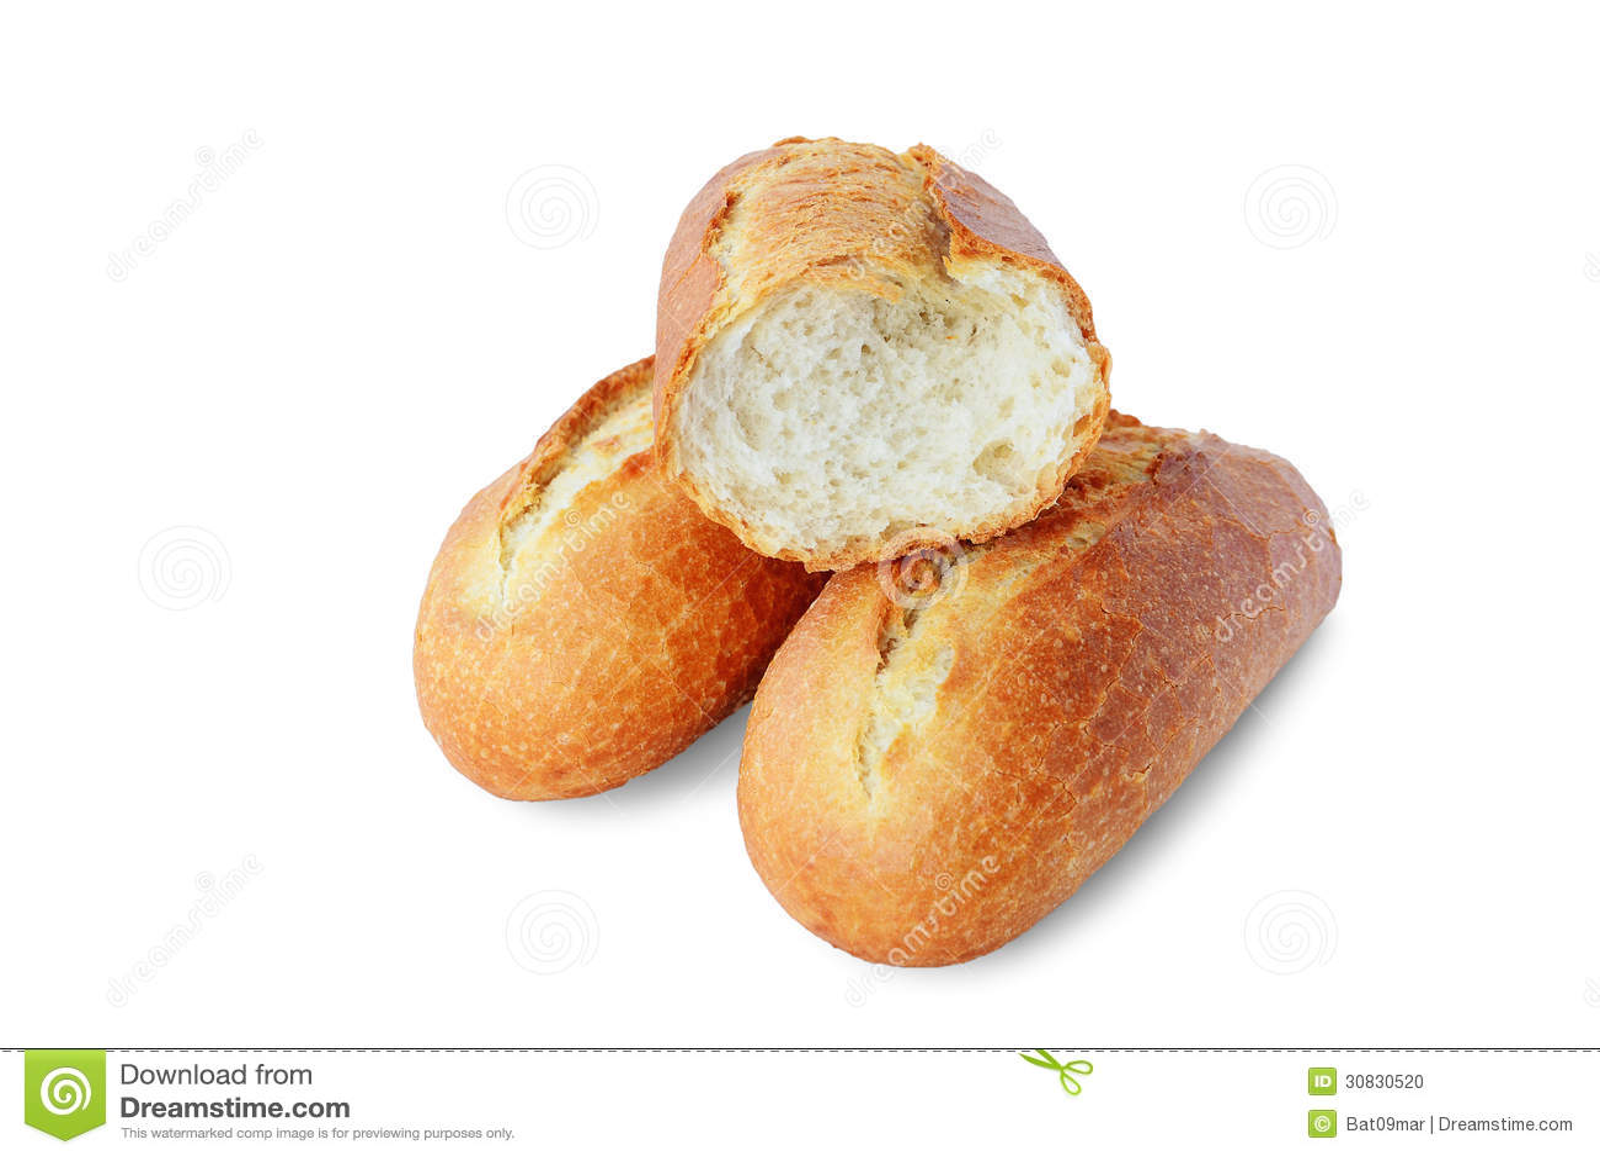 Baguette fresche su fondo bianco